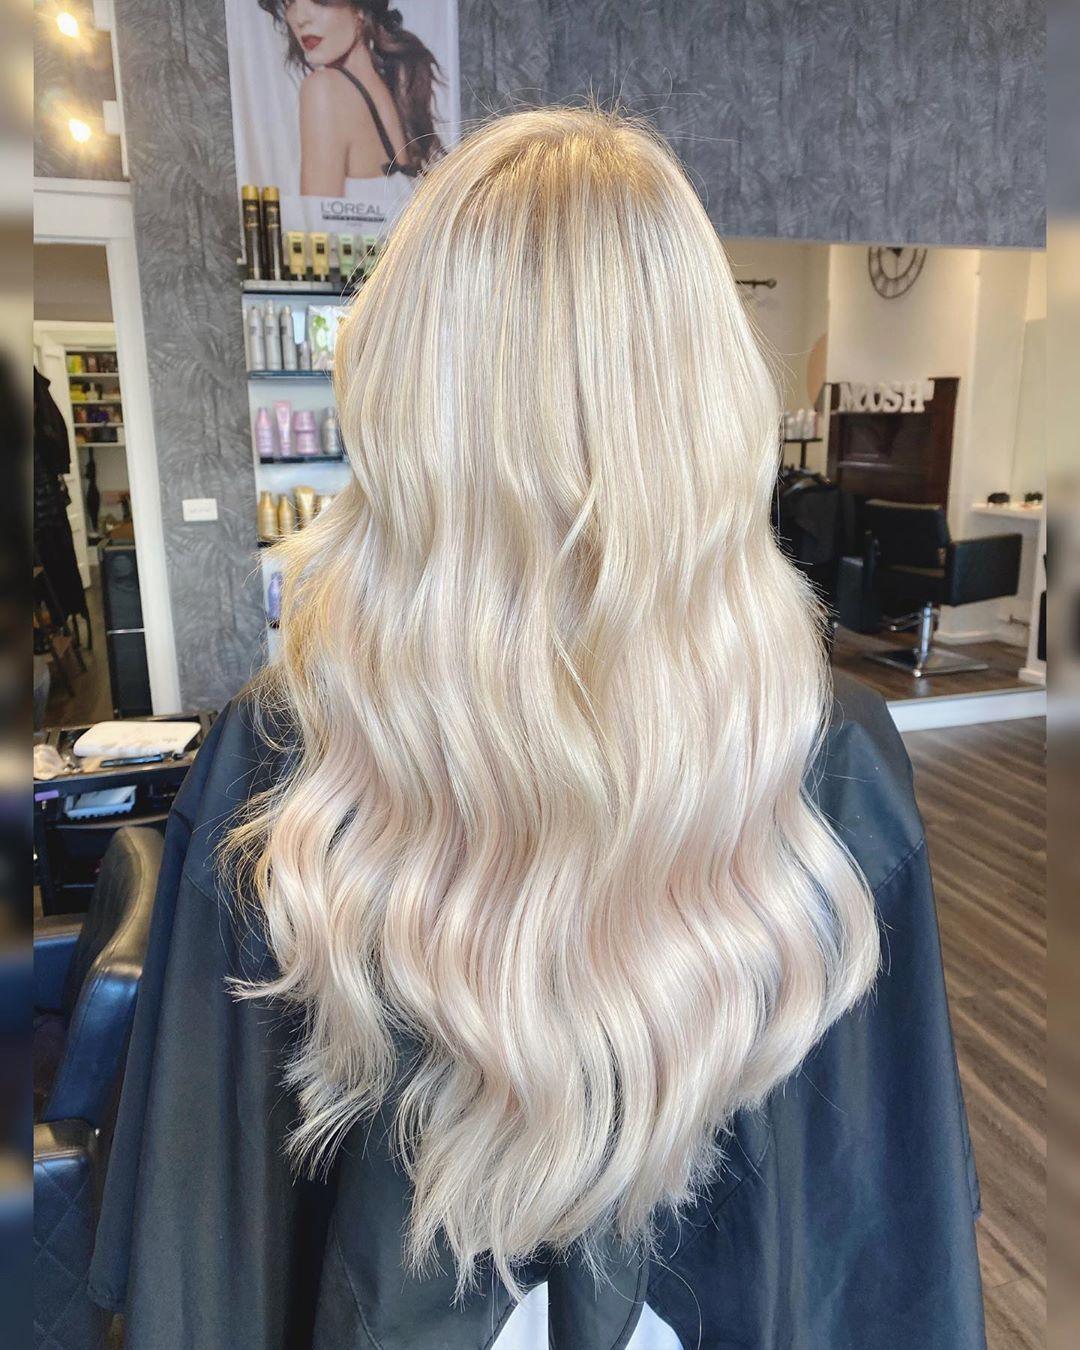 ZALA -  CLIP IN HAIR EXTENSIONS, REMY HUMAN HAIR E